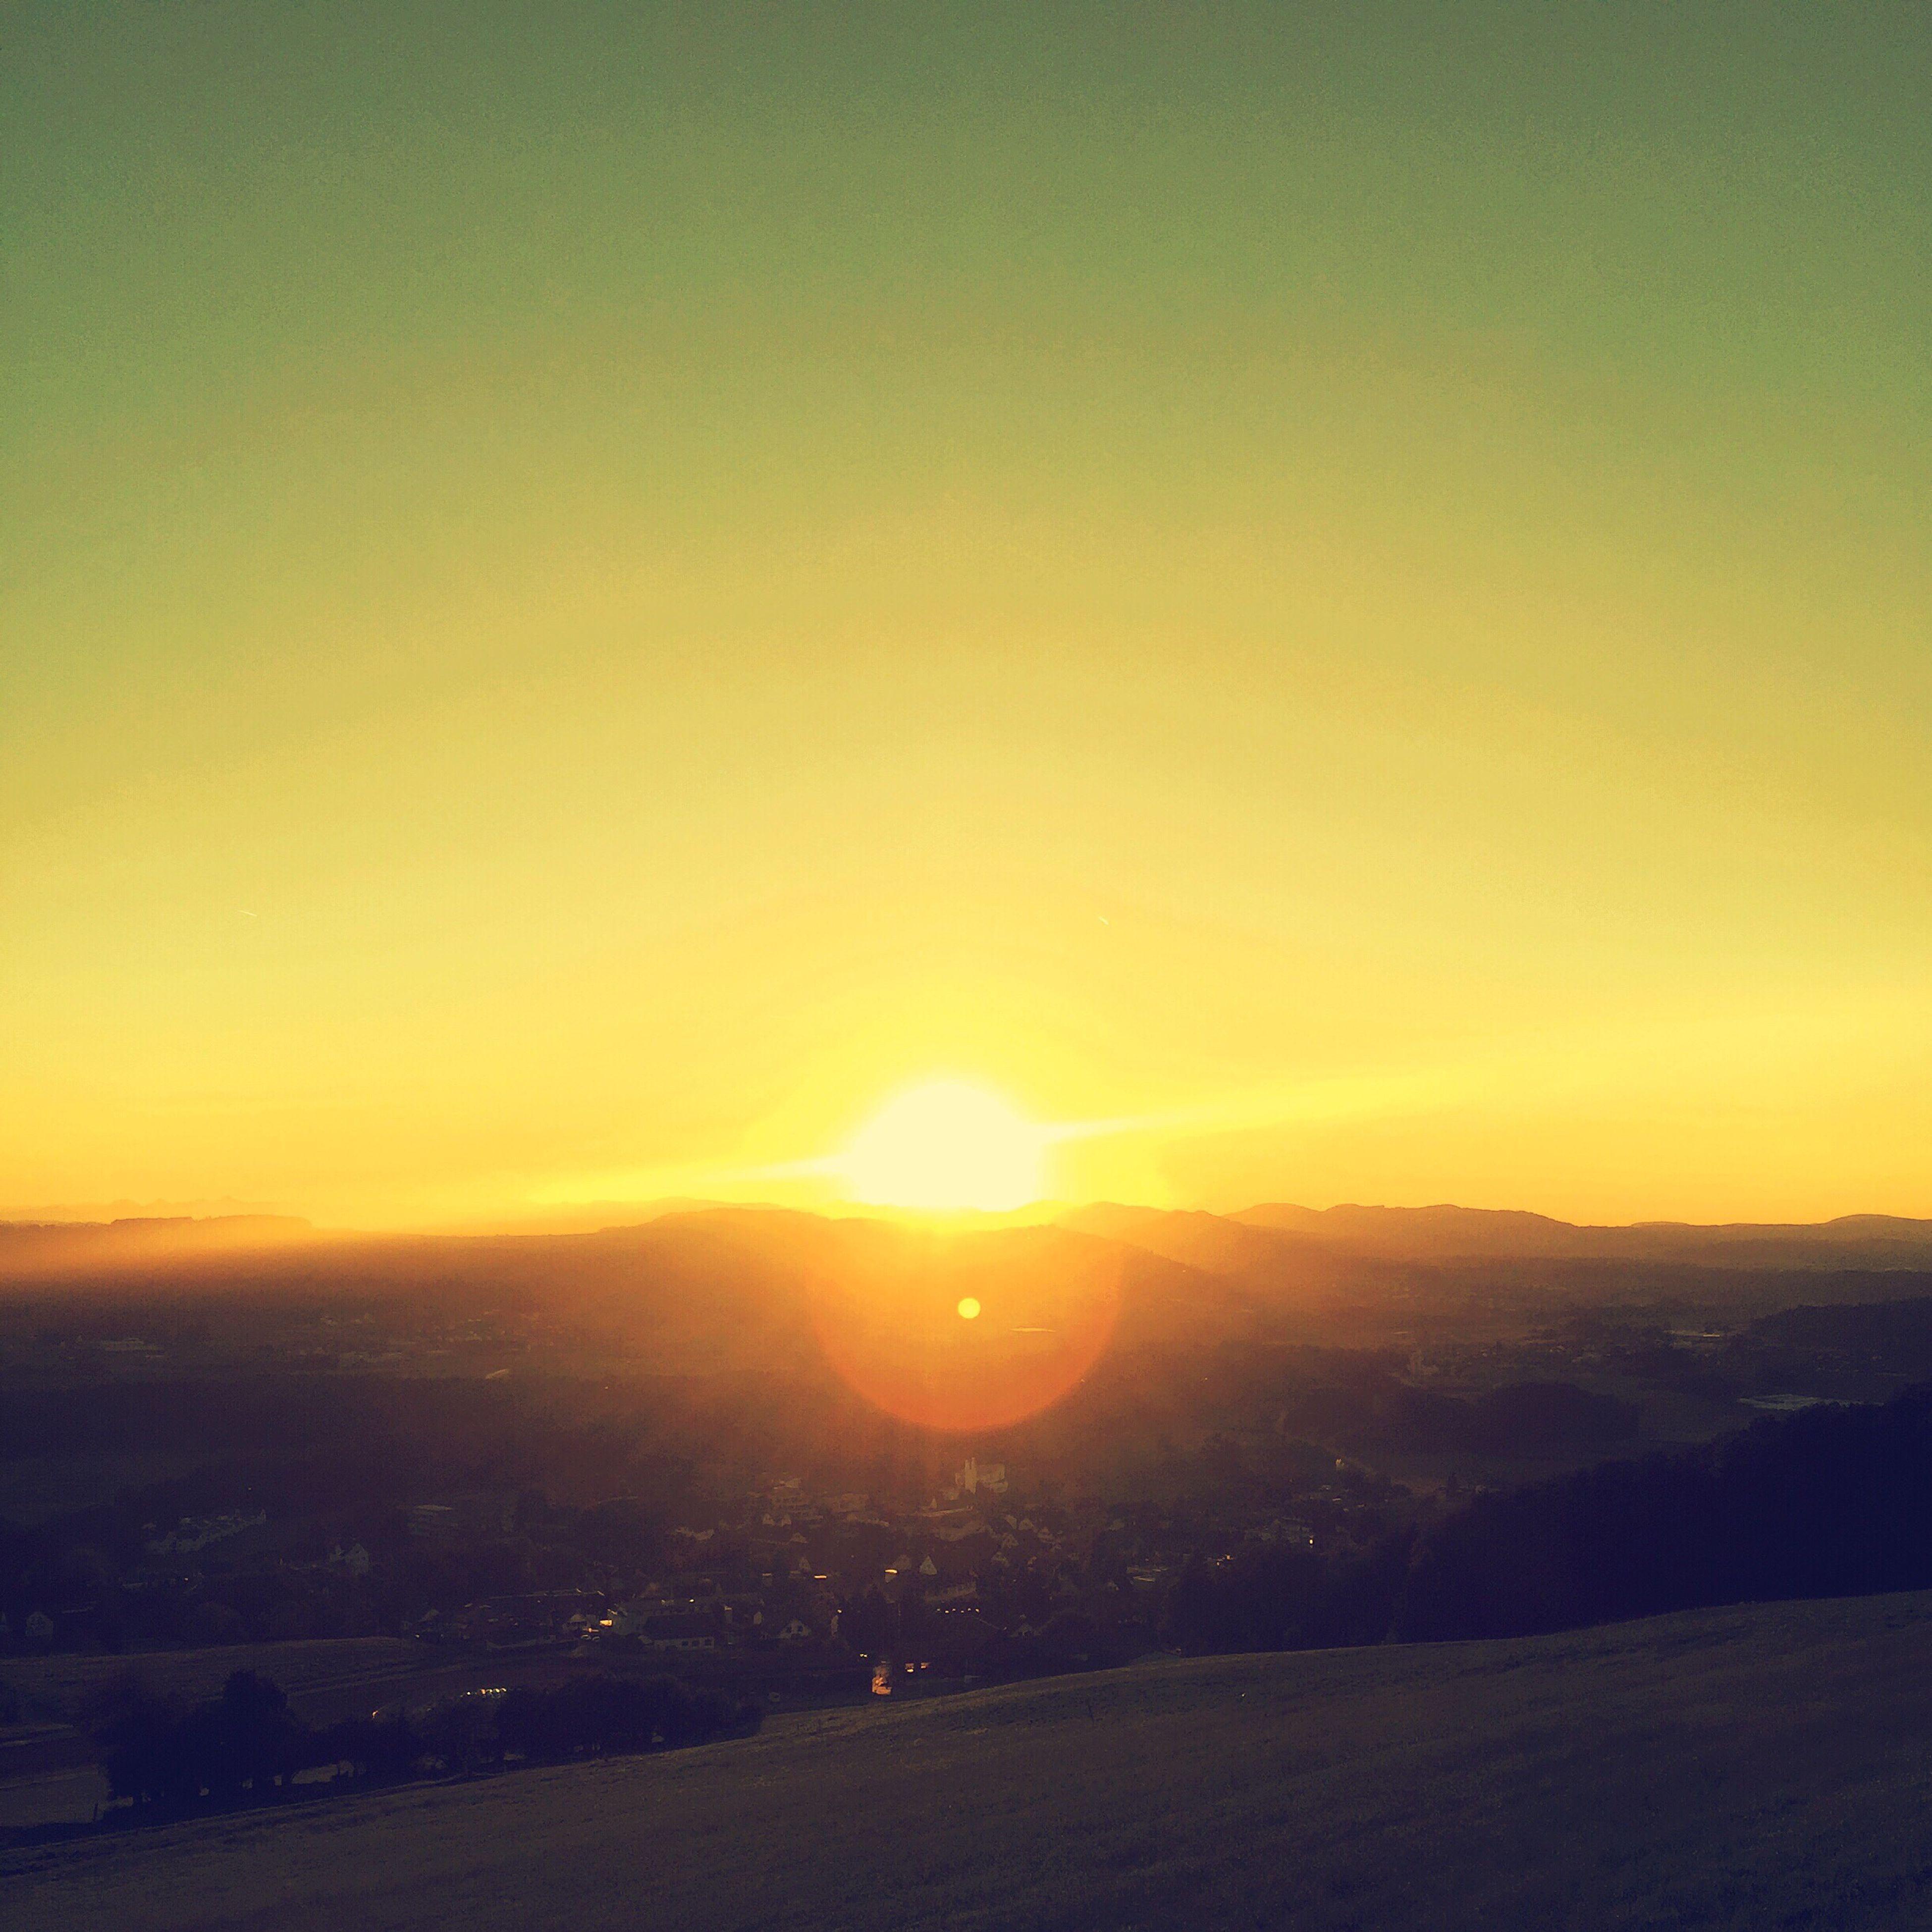 sunset, sun, landscape, tranquil scene, scenics, sunlight, beauty in nature, orange color, tranquility, nature, mountain, sunbeam, vibrant color, lens flare, sky, majestic, bright, dark, outdoors, rural scene, non-urban scene, no people, outline, solitude, dramatic sky, mountain range, remote